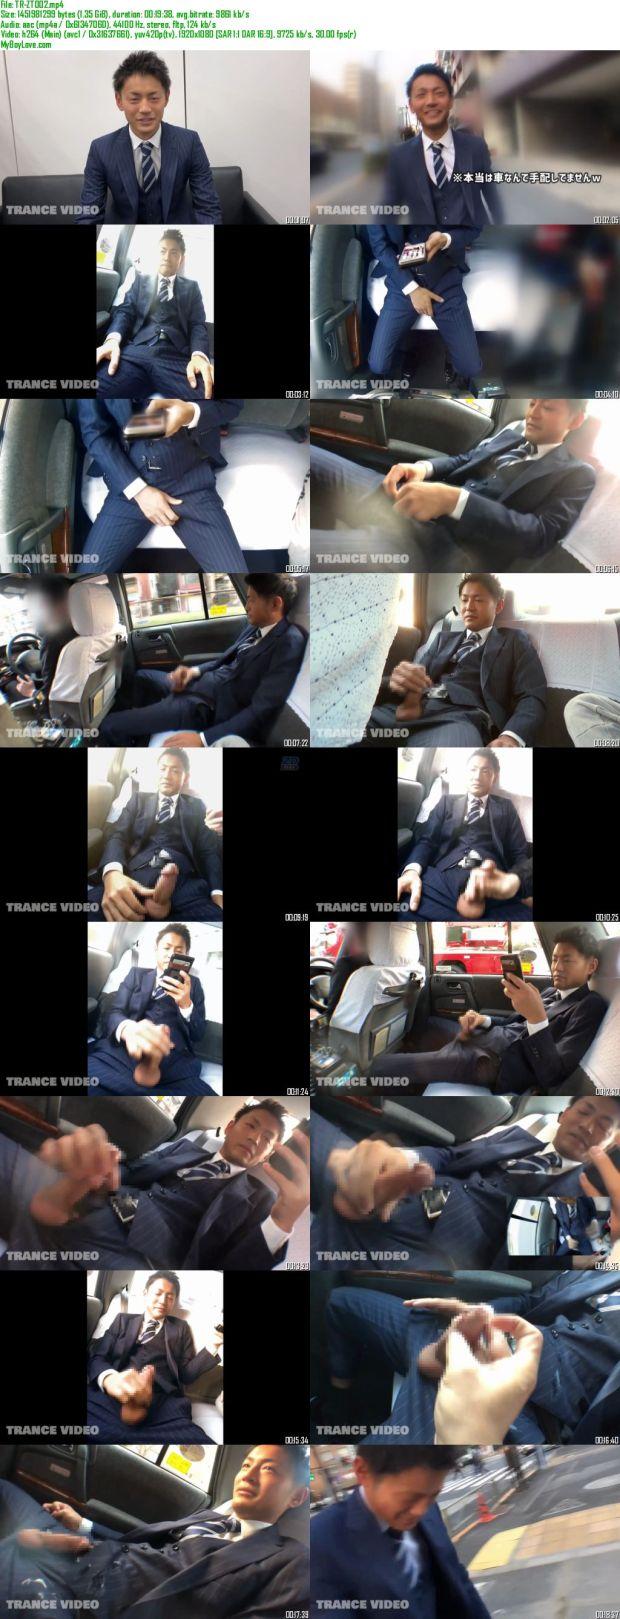 TRANCE VIDEO – TR-ZT002 – 絶頂TAXI part2